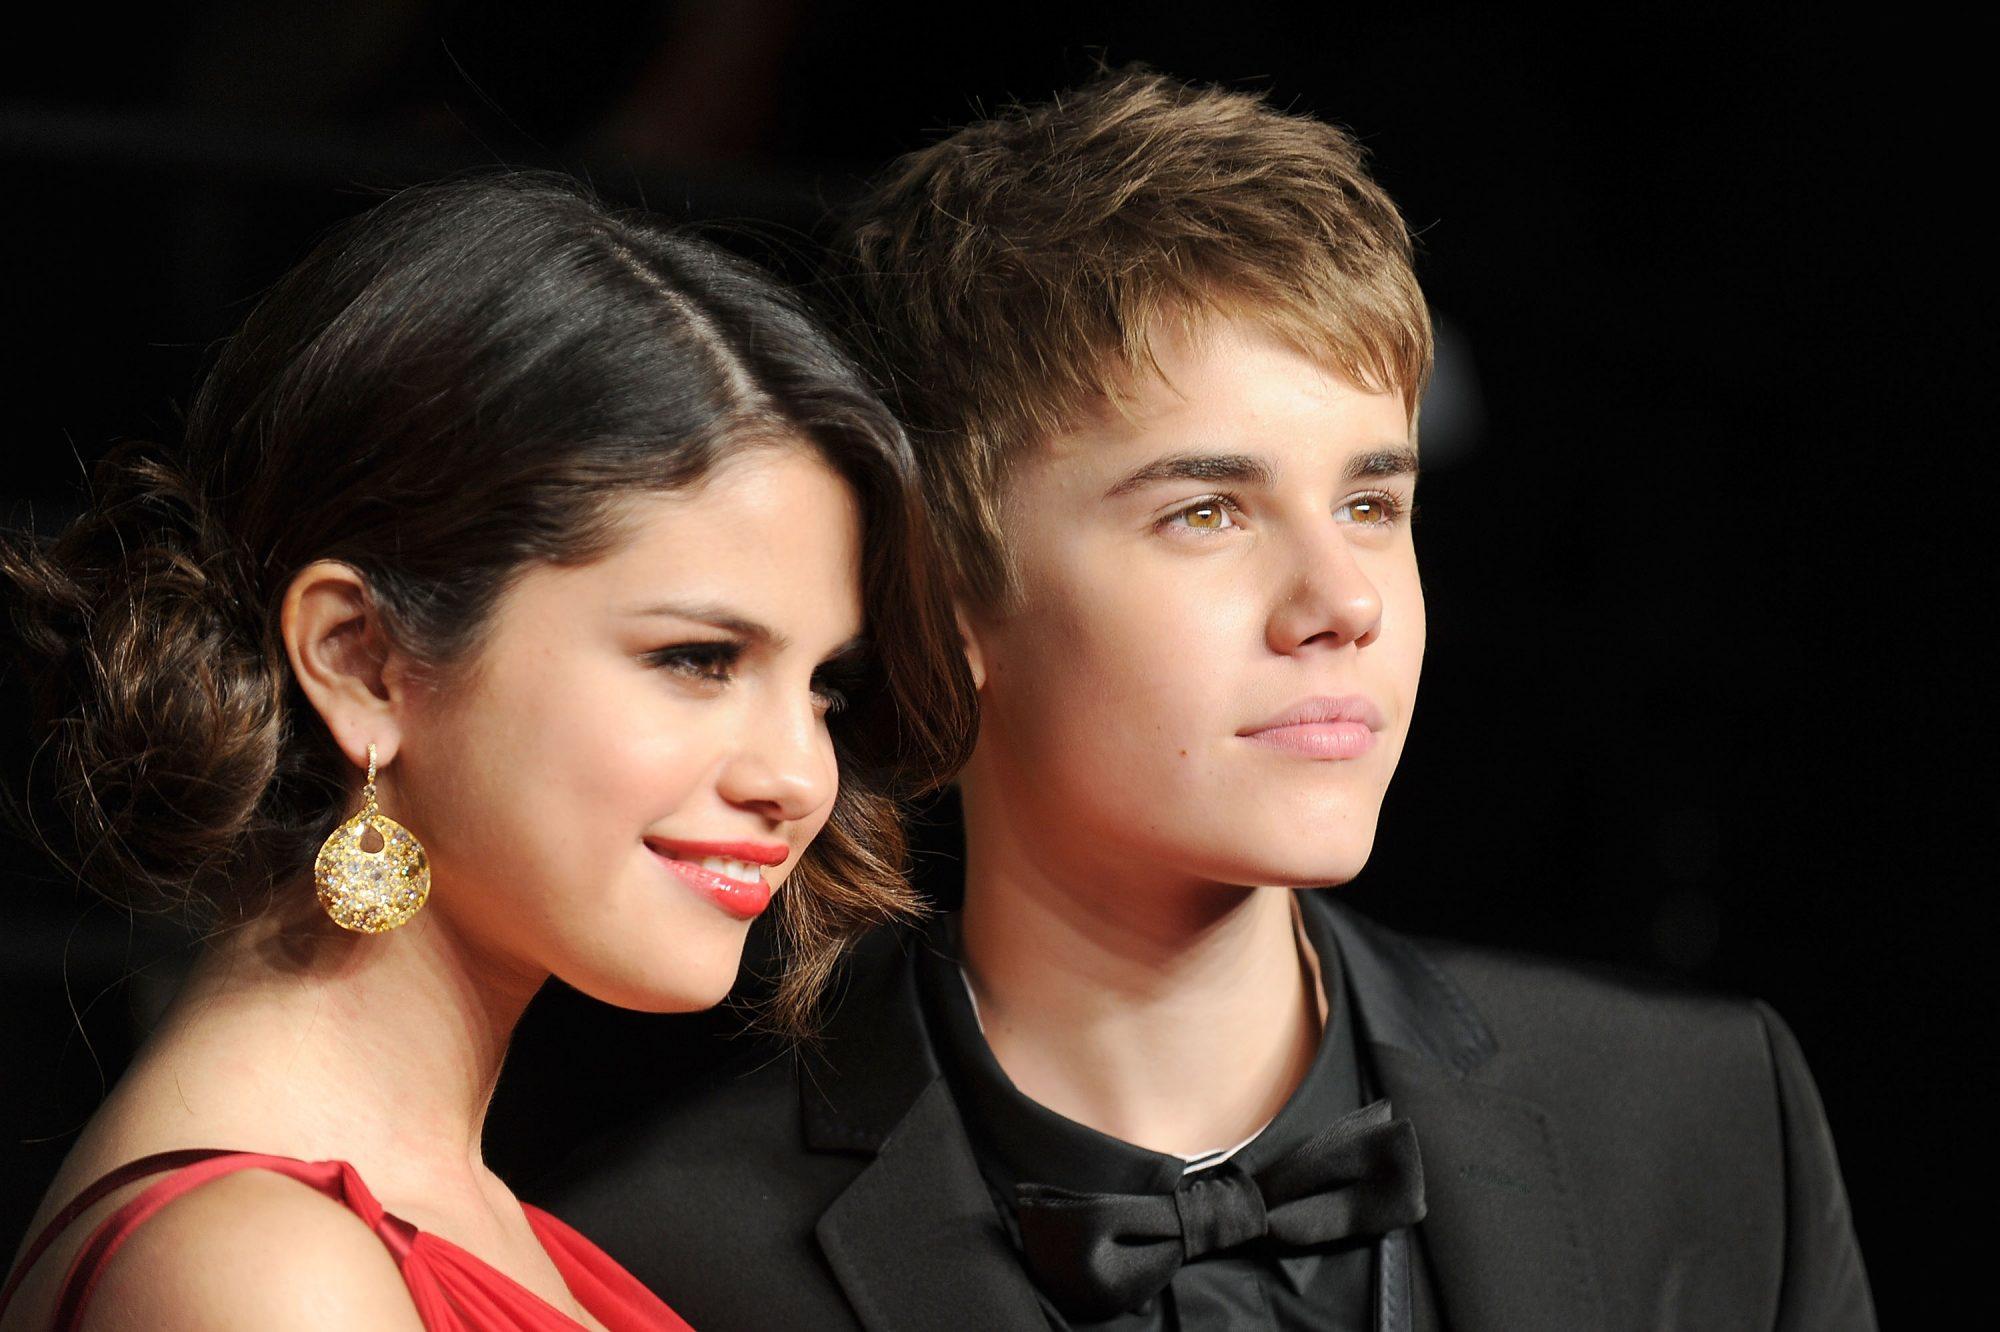 Justin-Bieber-and-Selena-Gomez.jpg